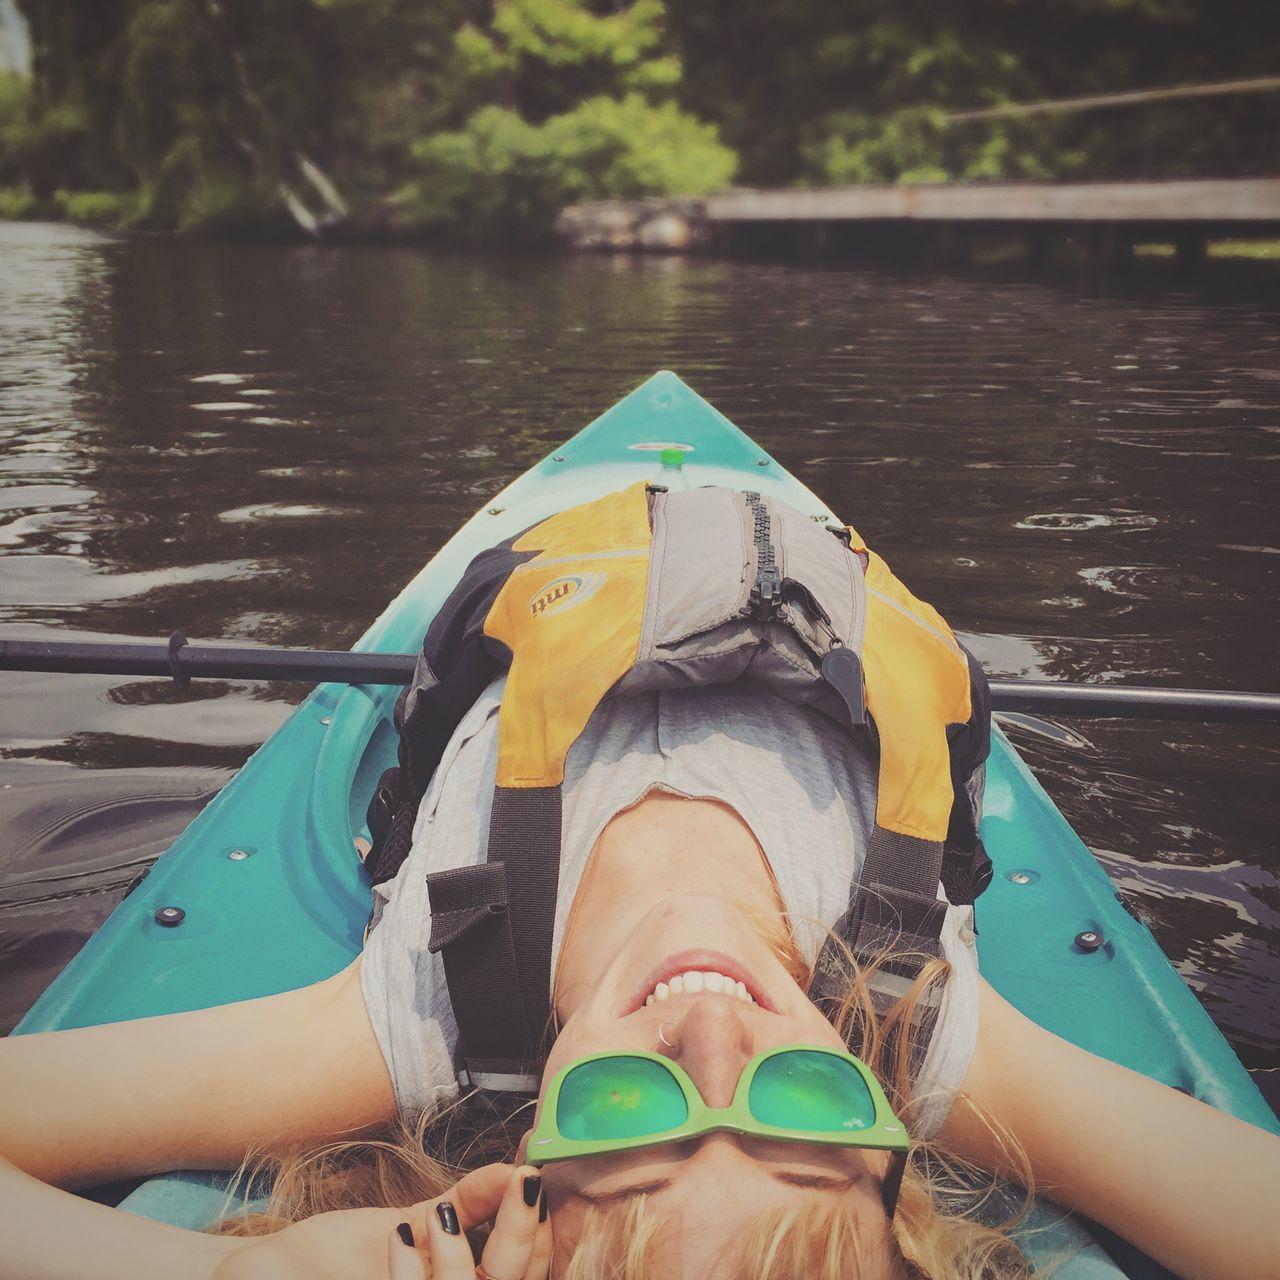 Kayaking Open Edit On The Water Outdoors Adventure Girl Smile Sunglasses